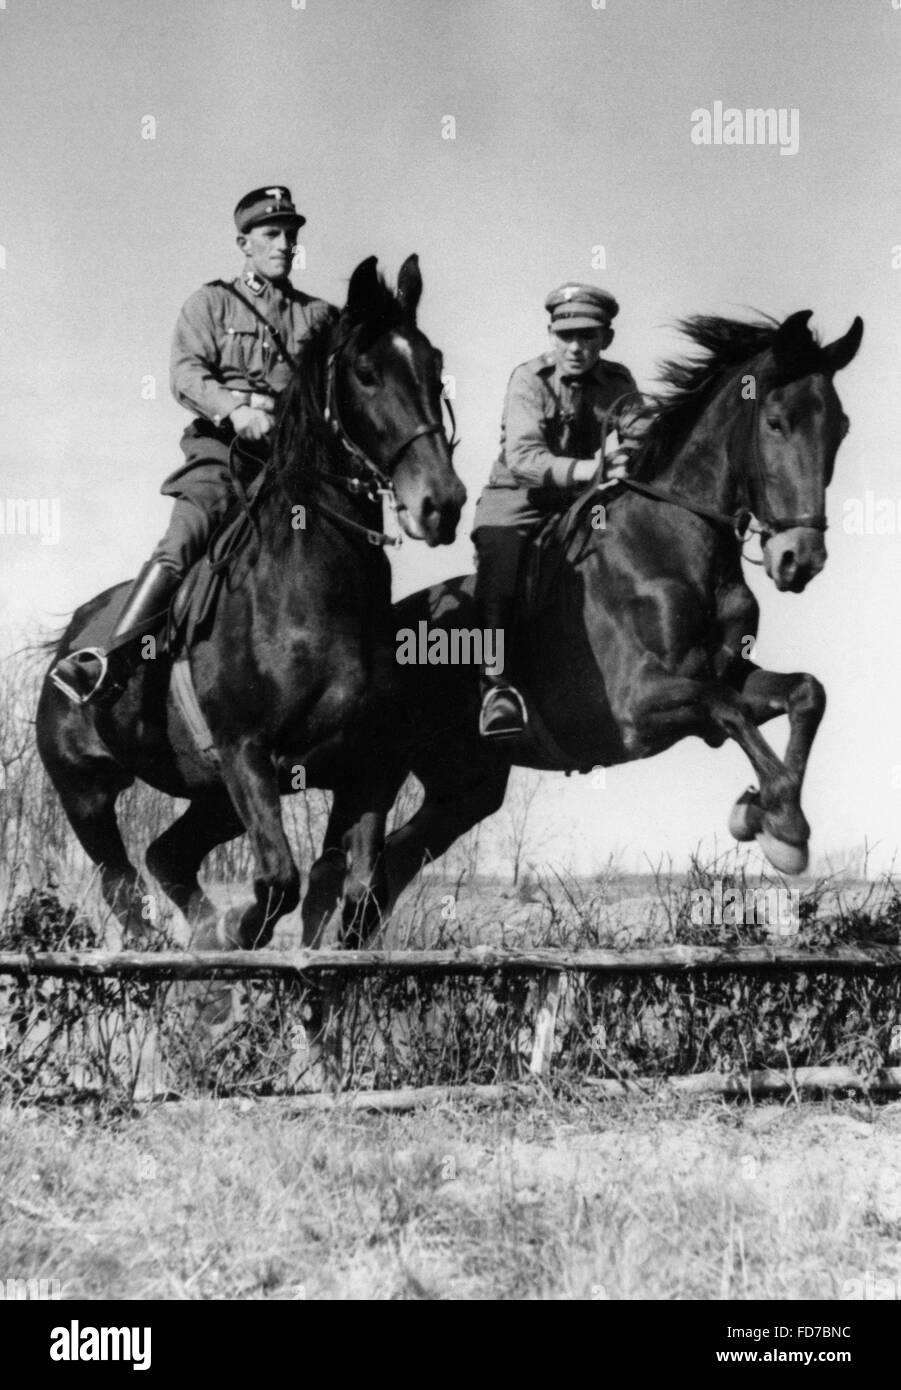 SA men on horseback, 1938 - Stock Image